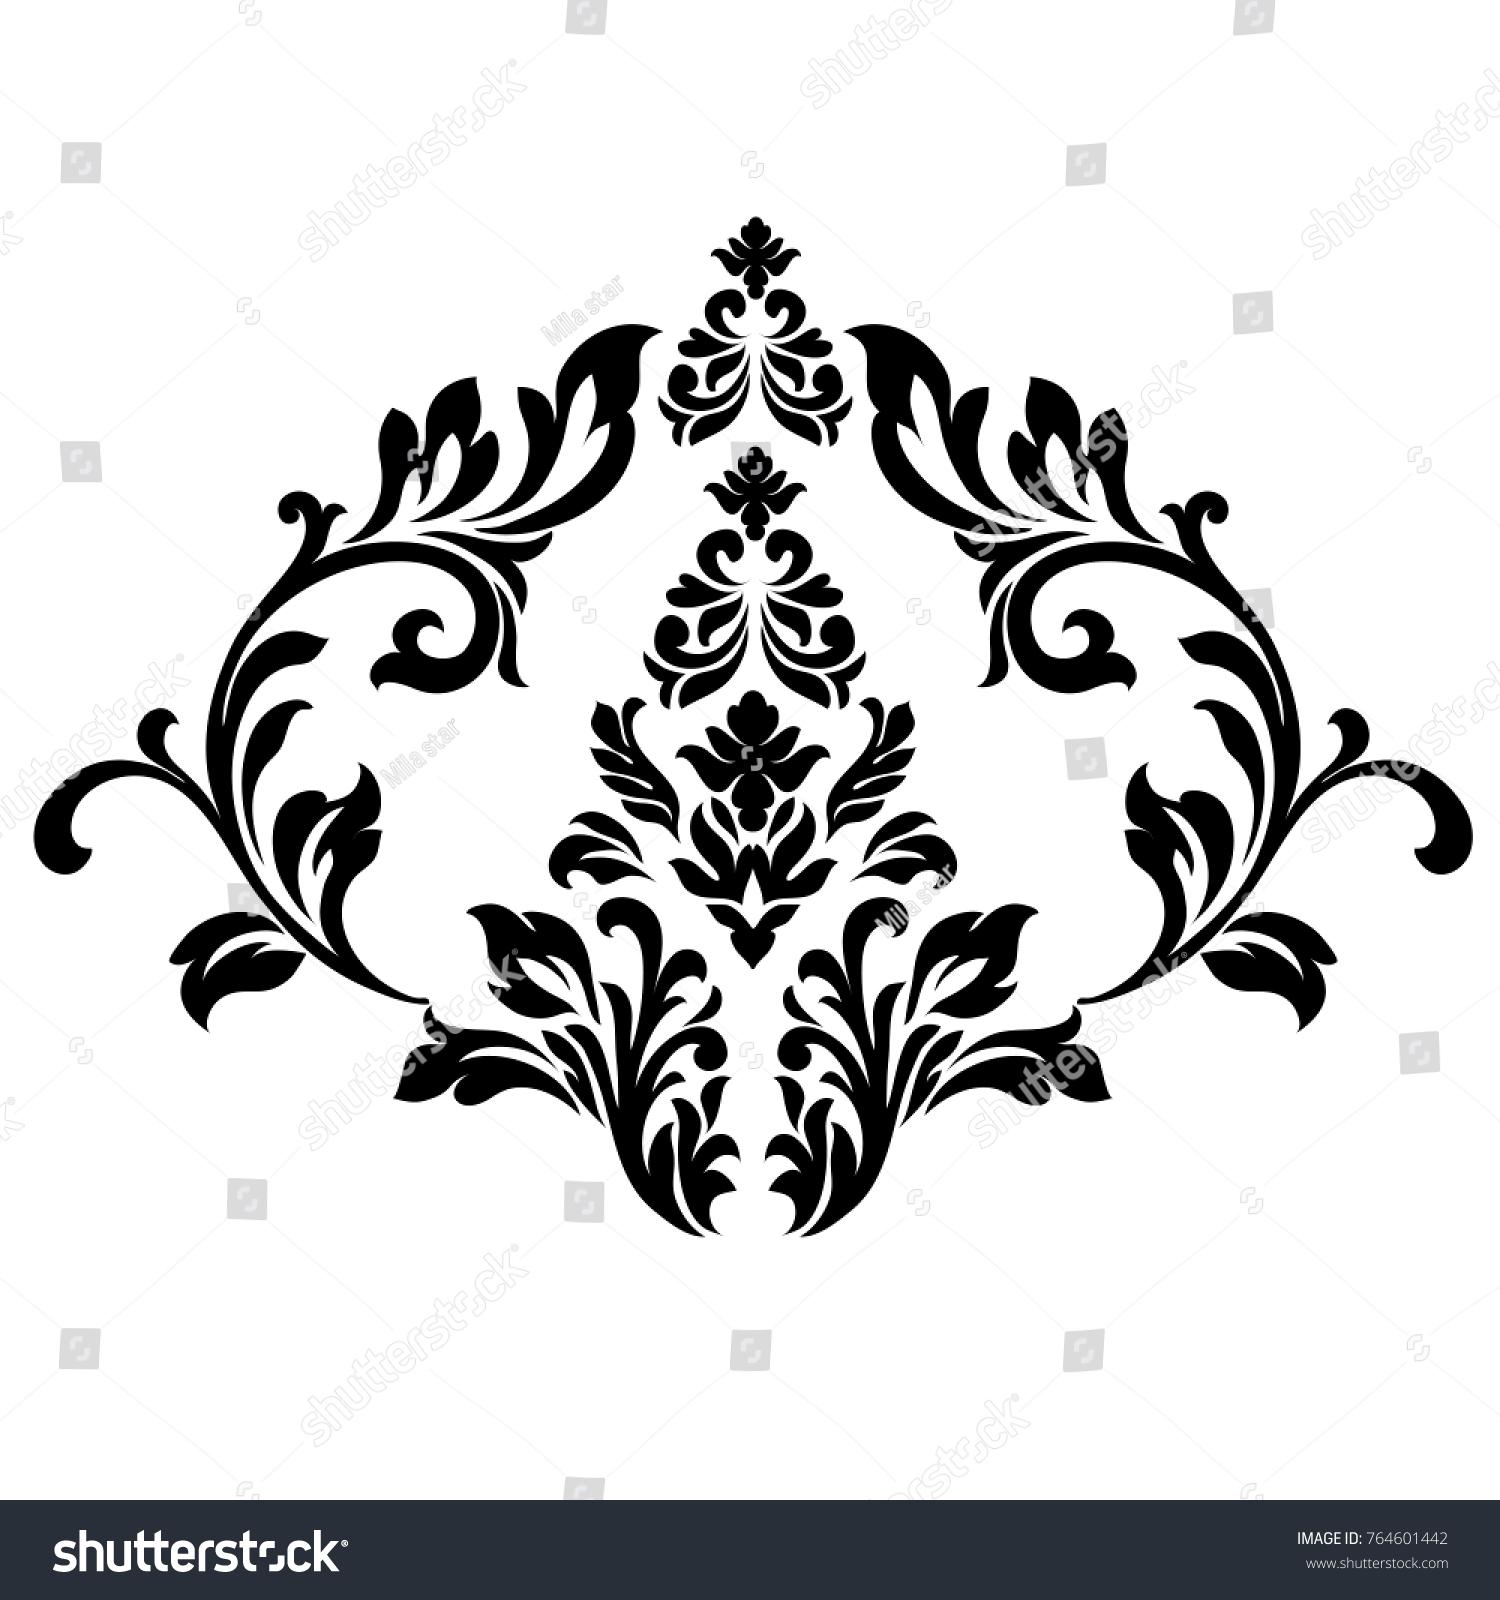 Vector Victorian Style Ornate Element Design Stock Photo (Photo ...